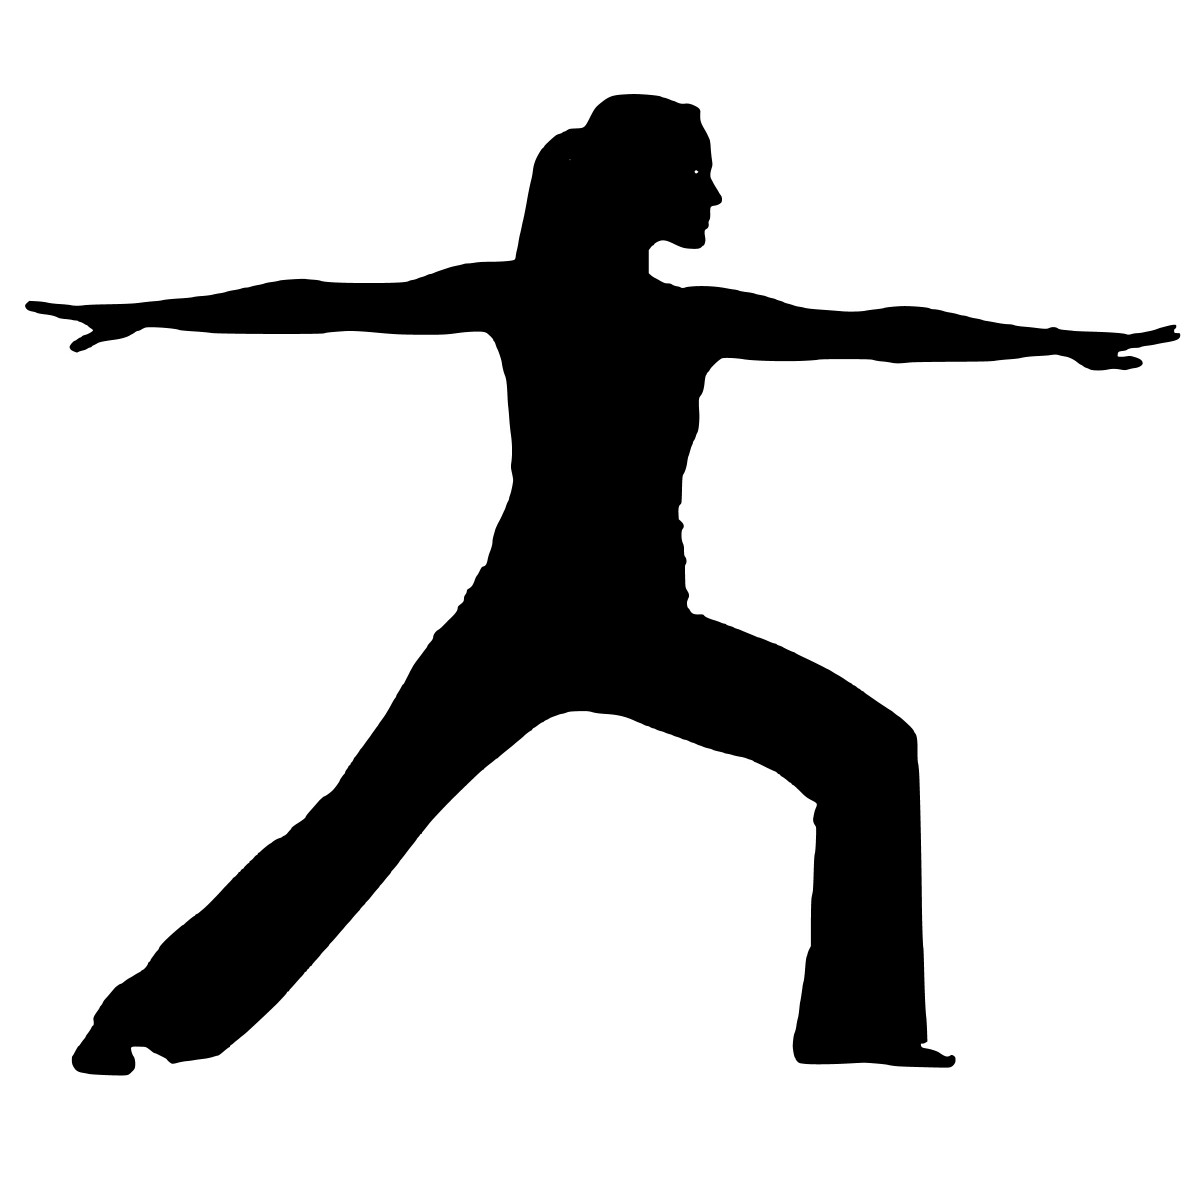 Cartoon of a woman doing pilates